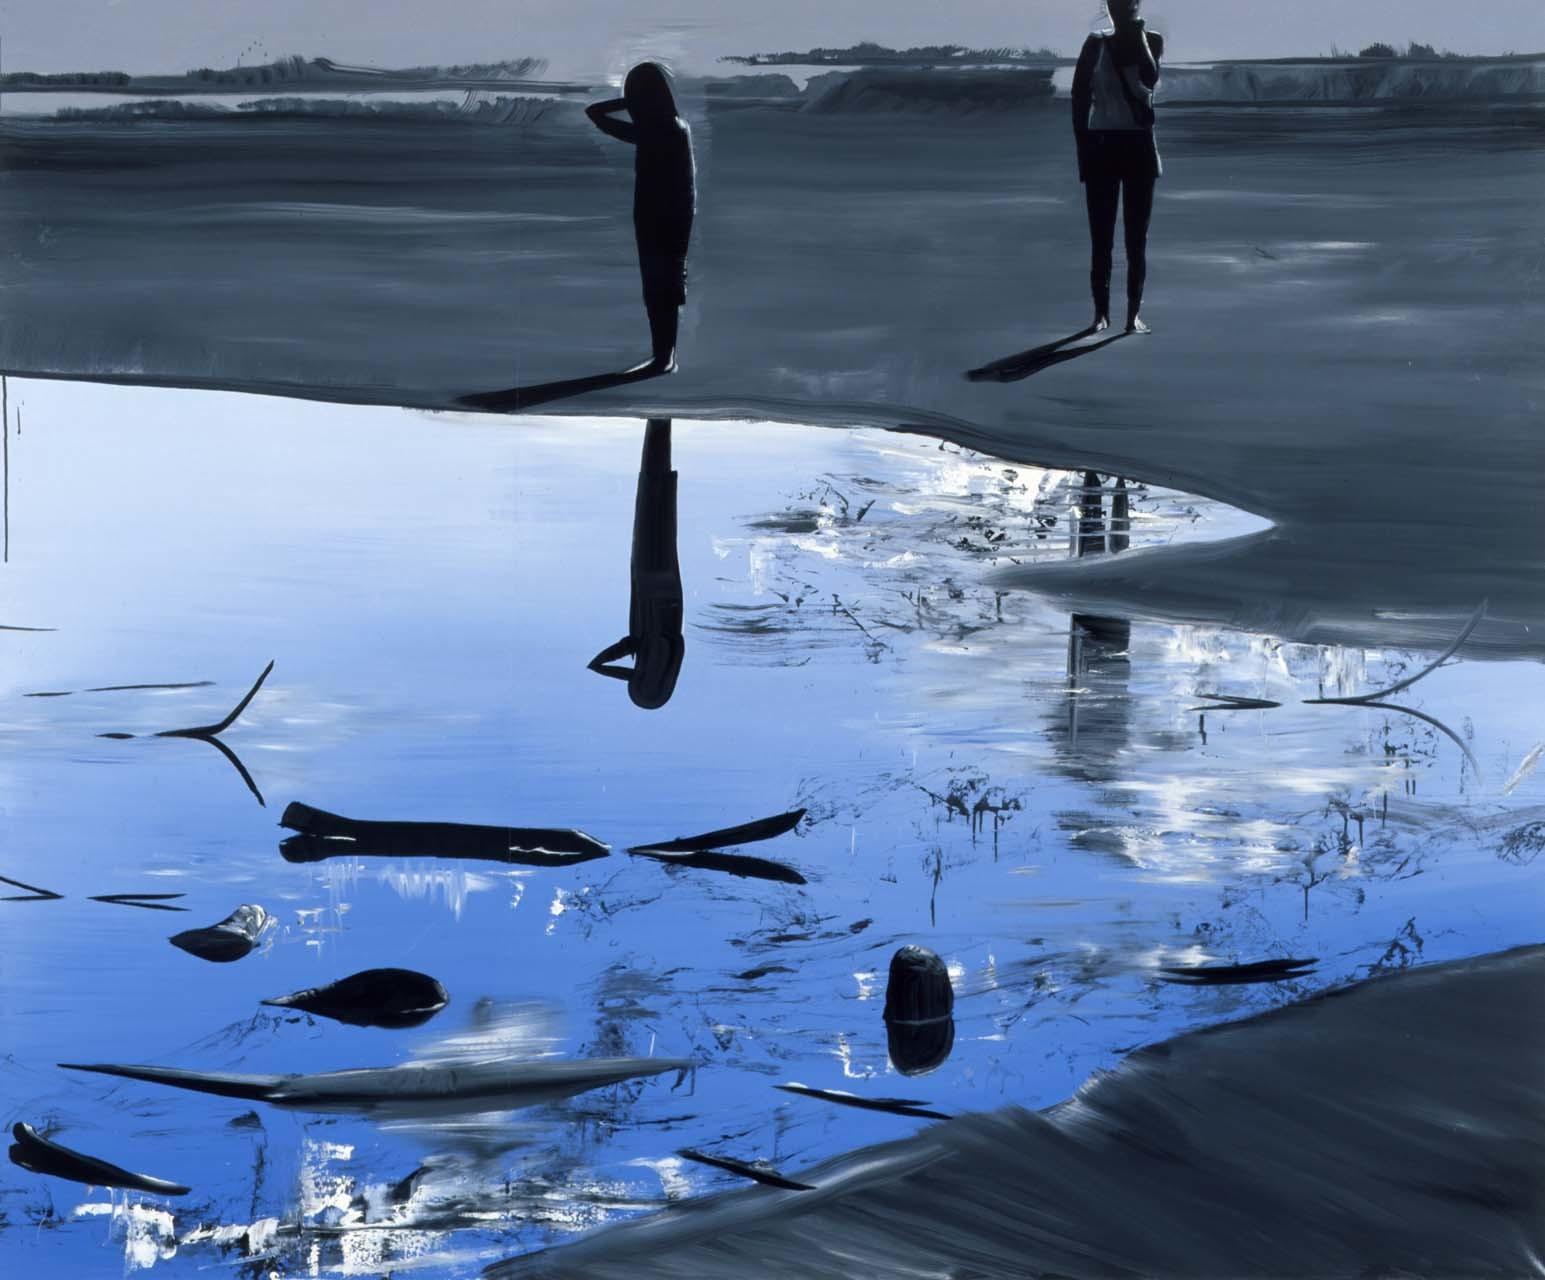 "<div class=""artwork_caption""><p>untitled (kacper and anka), 2009</p></div>"